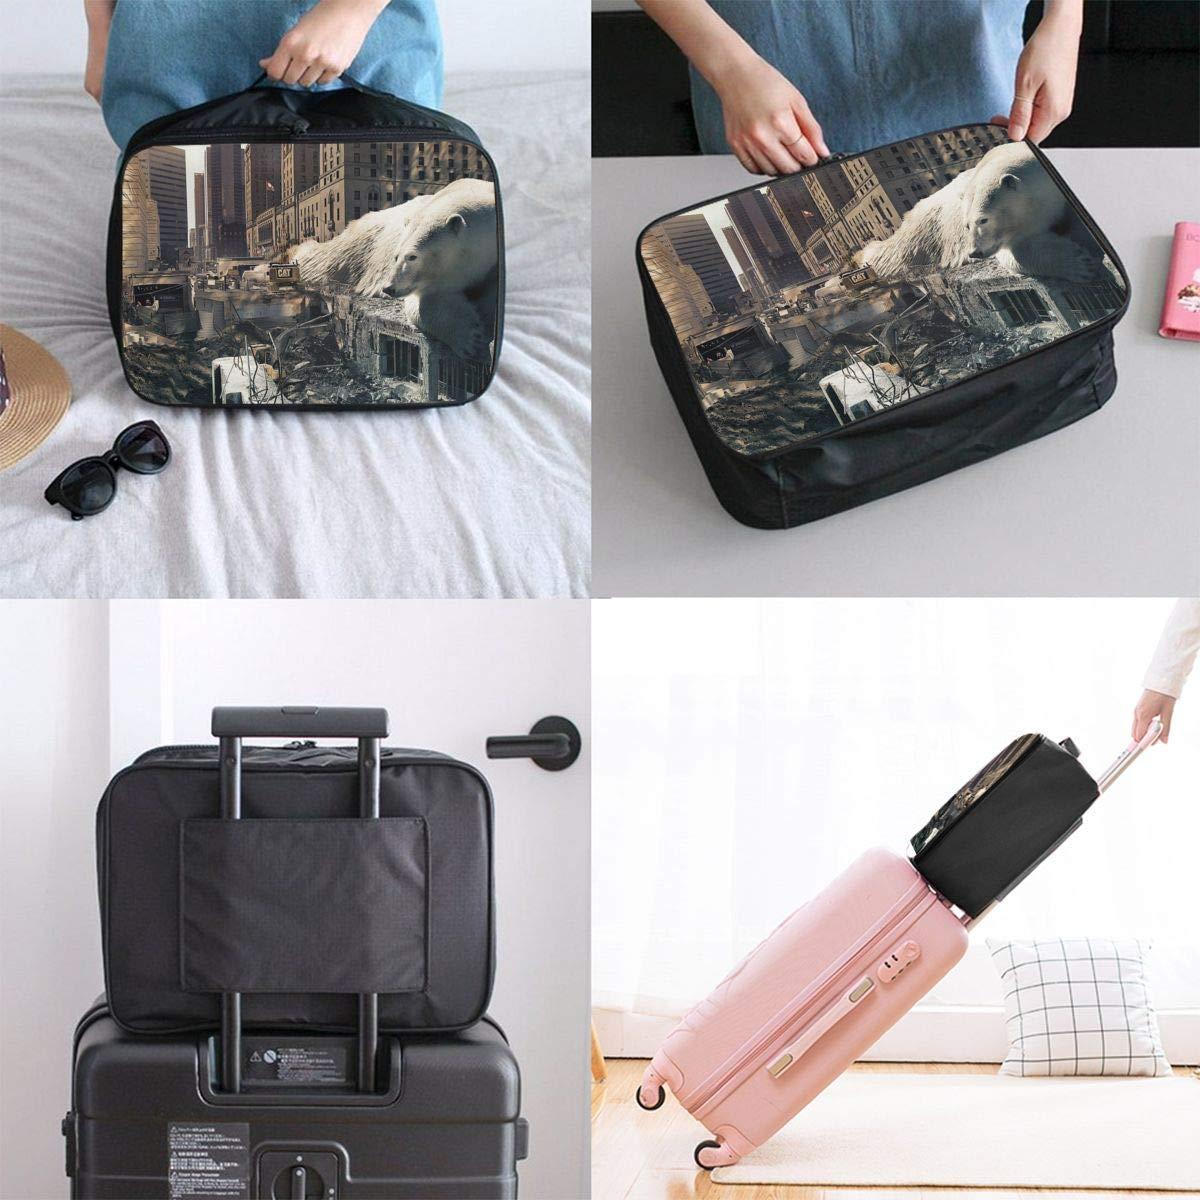 JTRVW Luggage Bags for Travel Lightweight Large Capacity Portable Duffel Bag for Men /& Women Bear Urban Destruction Travel Duffel Bag Backpack